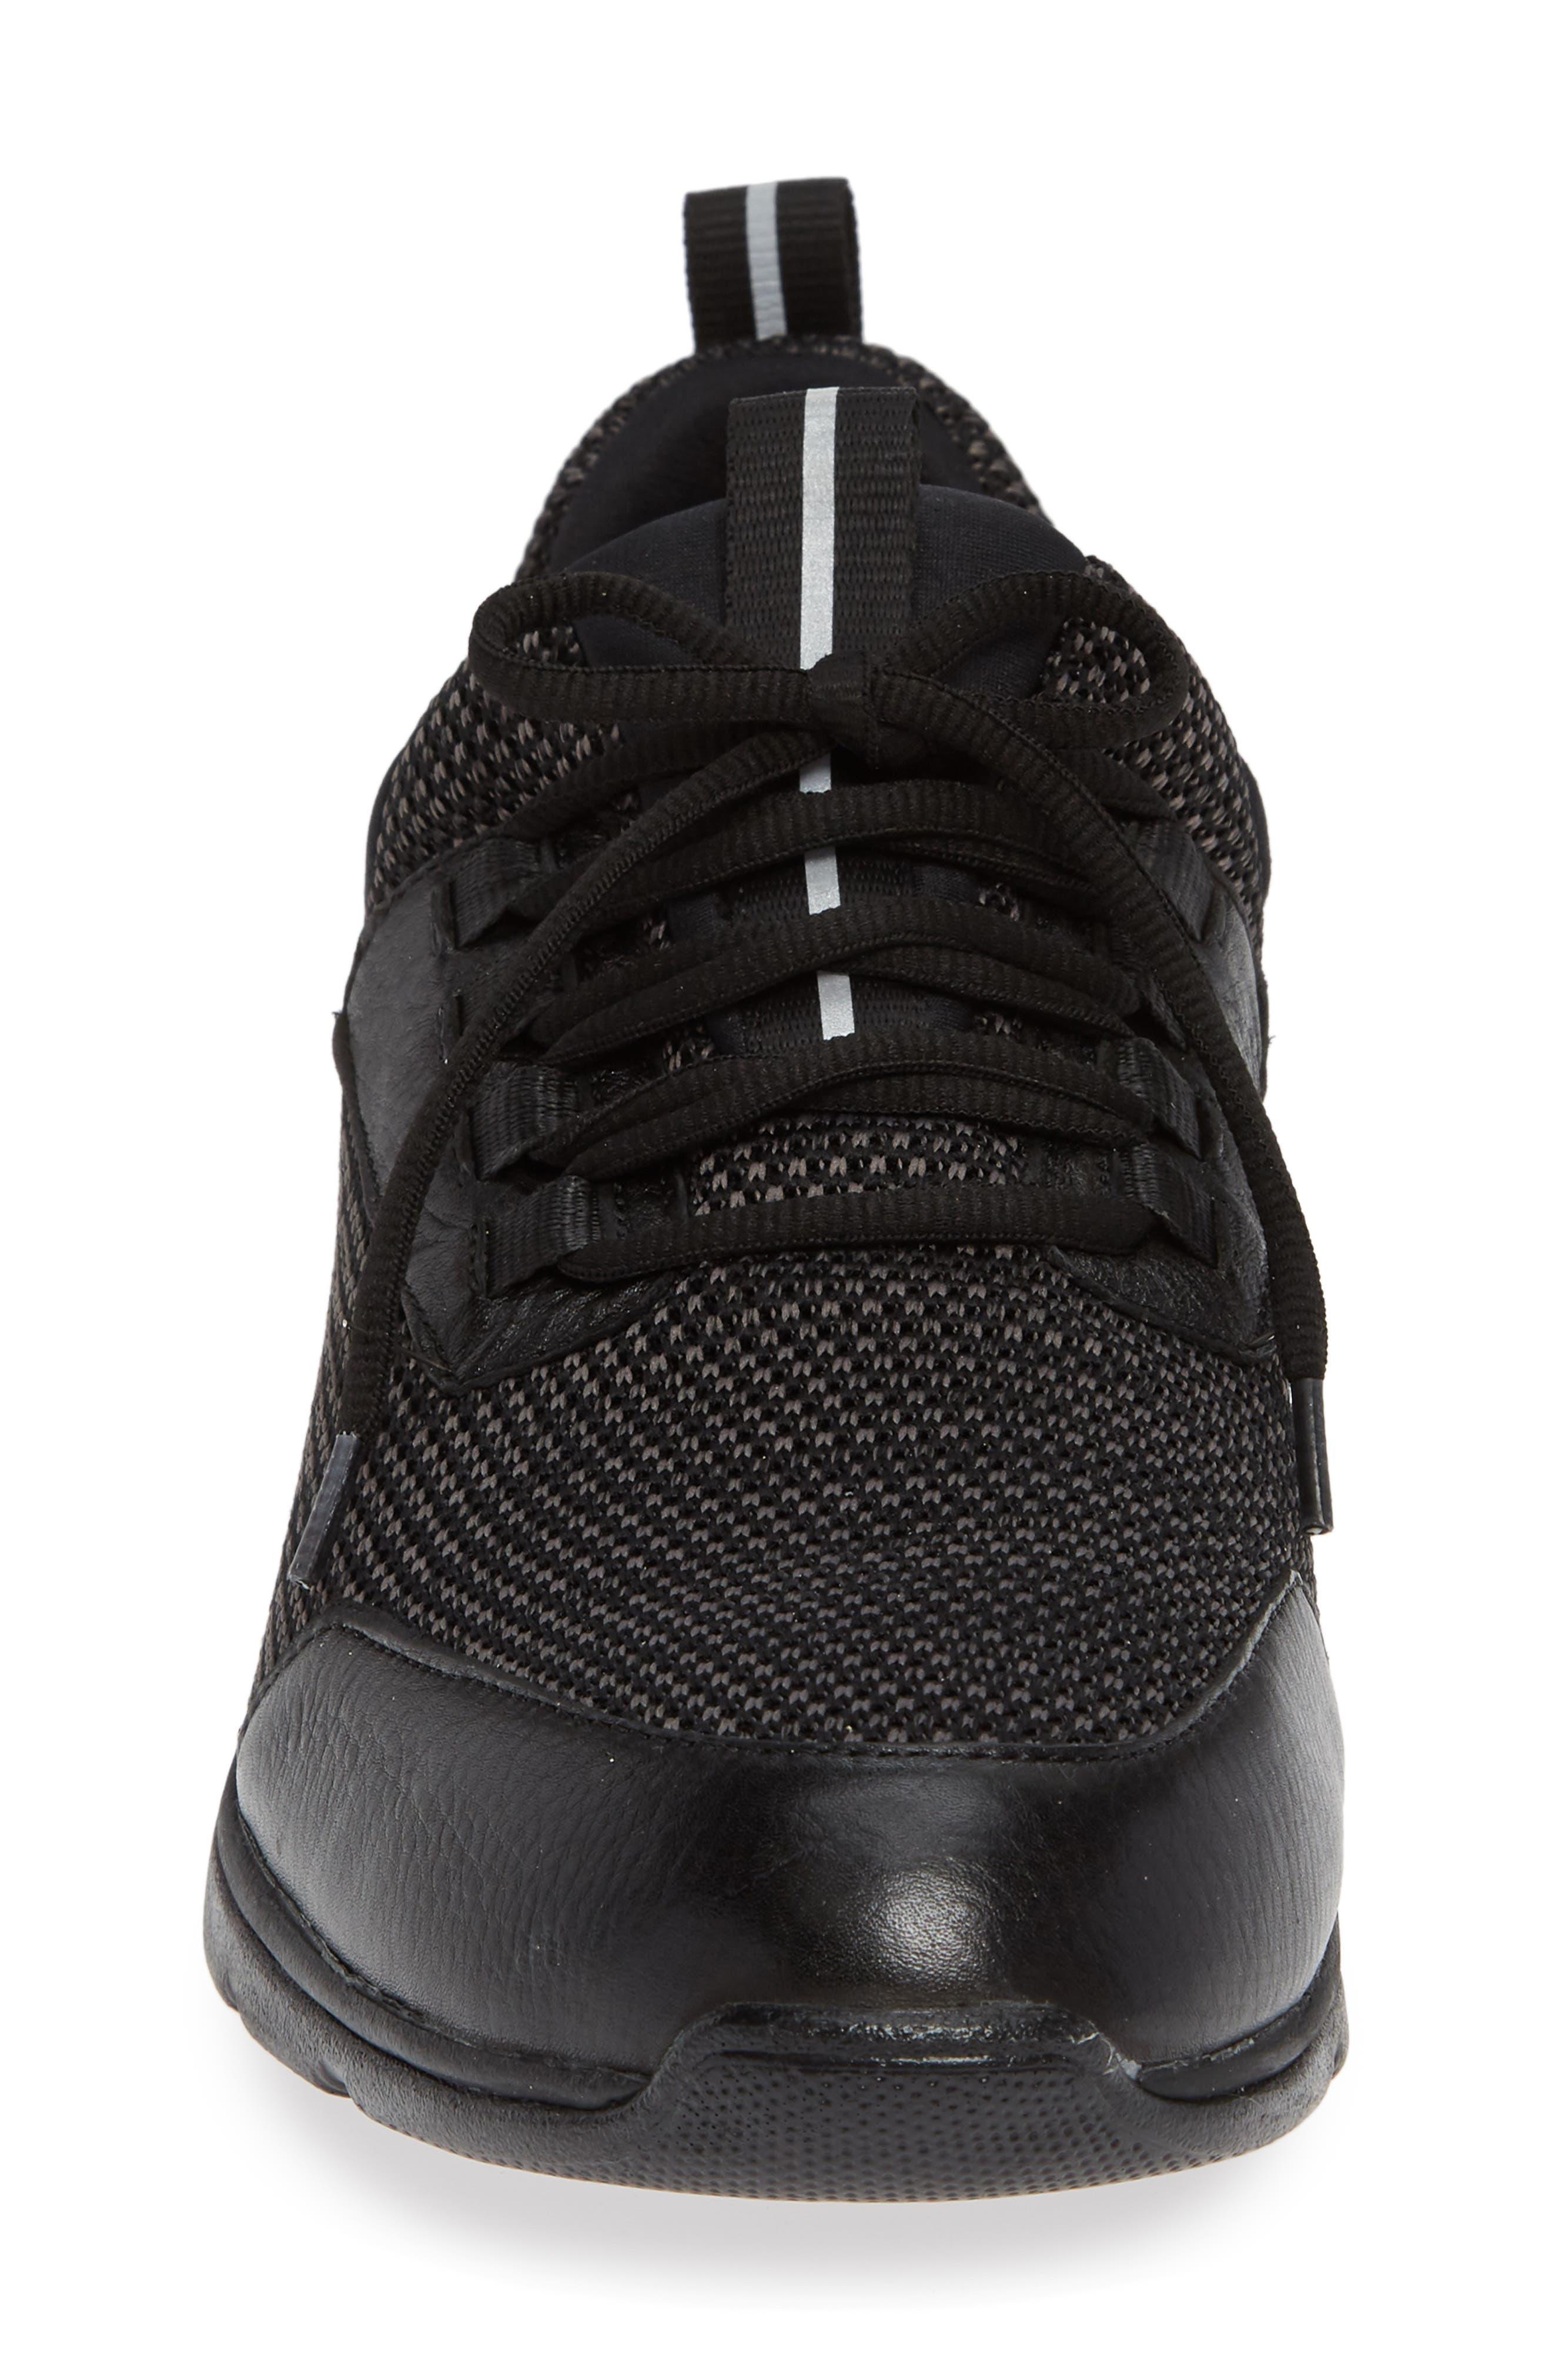 JOHNSTON & MURPHY, Prentiss XC4<sup>®</sup> Waterproof Sneaker, Alternate thumbnail 4, color, BLACK LEATHER